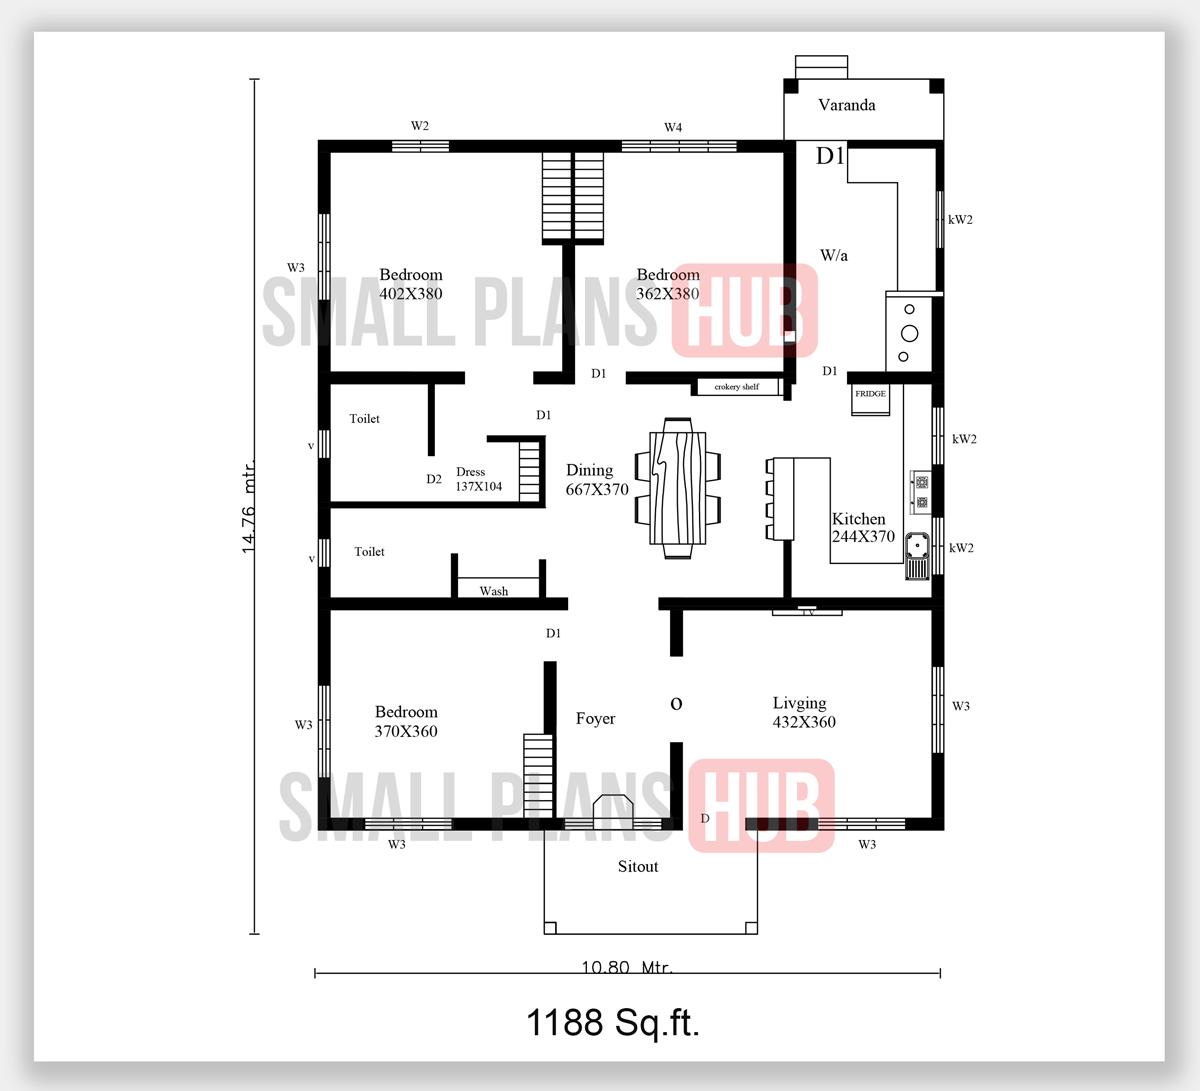 Kerala Model 3 Bedroom House Plans Total 3 House Plans Under 1250 Sq Ft Small Plans Hub,Beach House Floor Plans Bloxburg